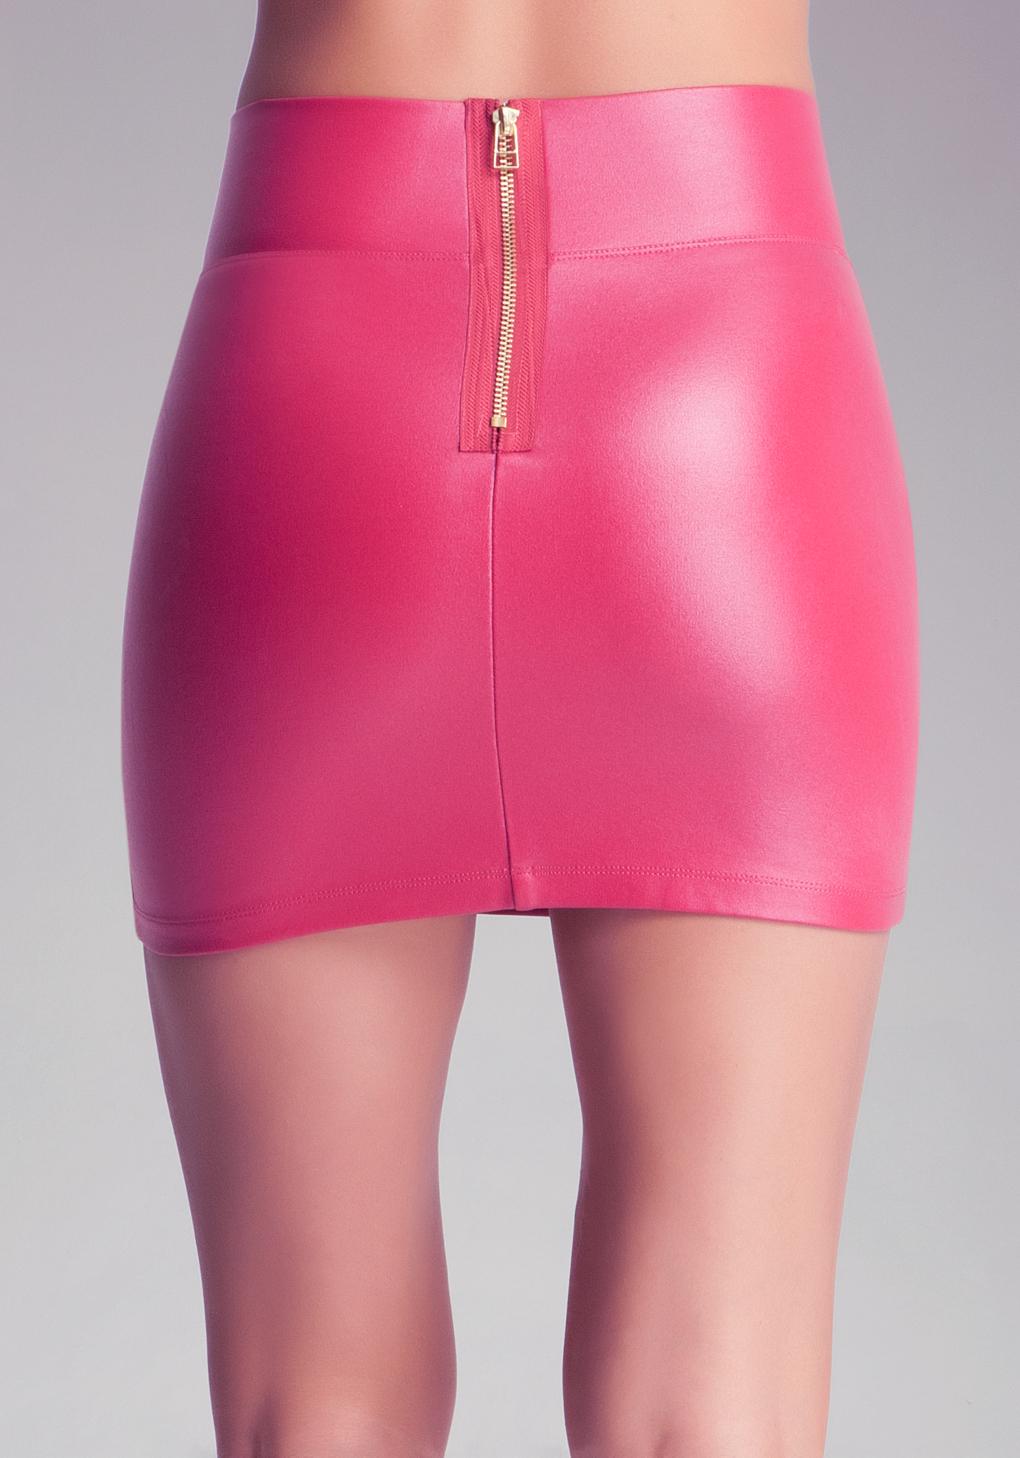 Bebe High Waist Mini Skirt in Pink | Lyst